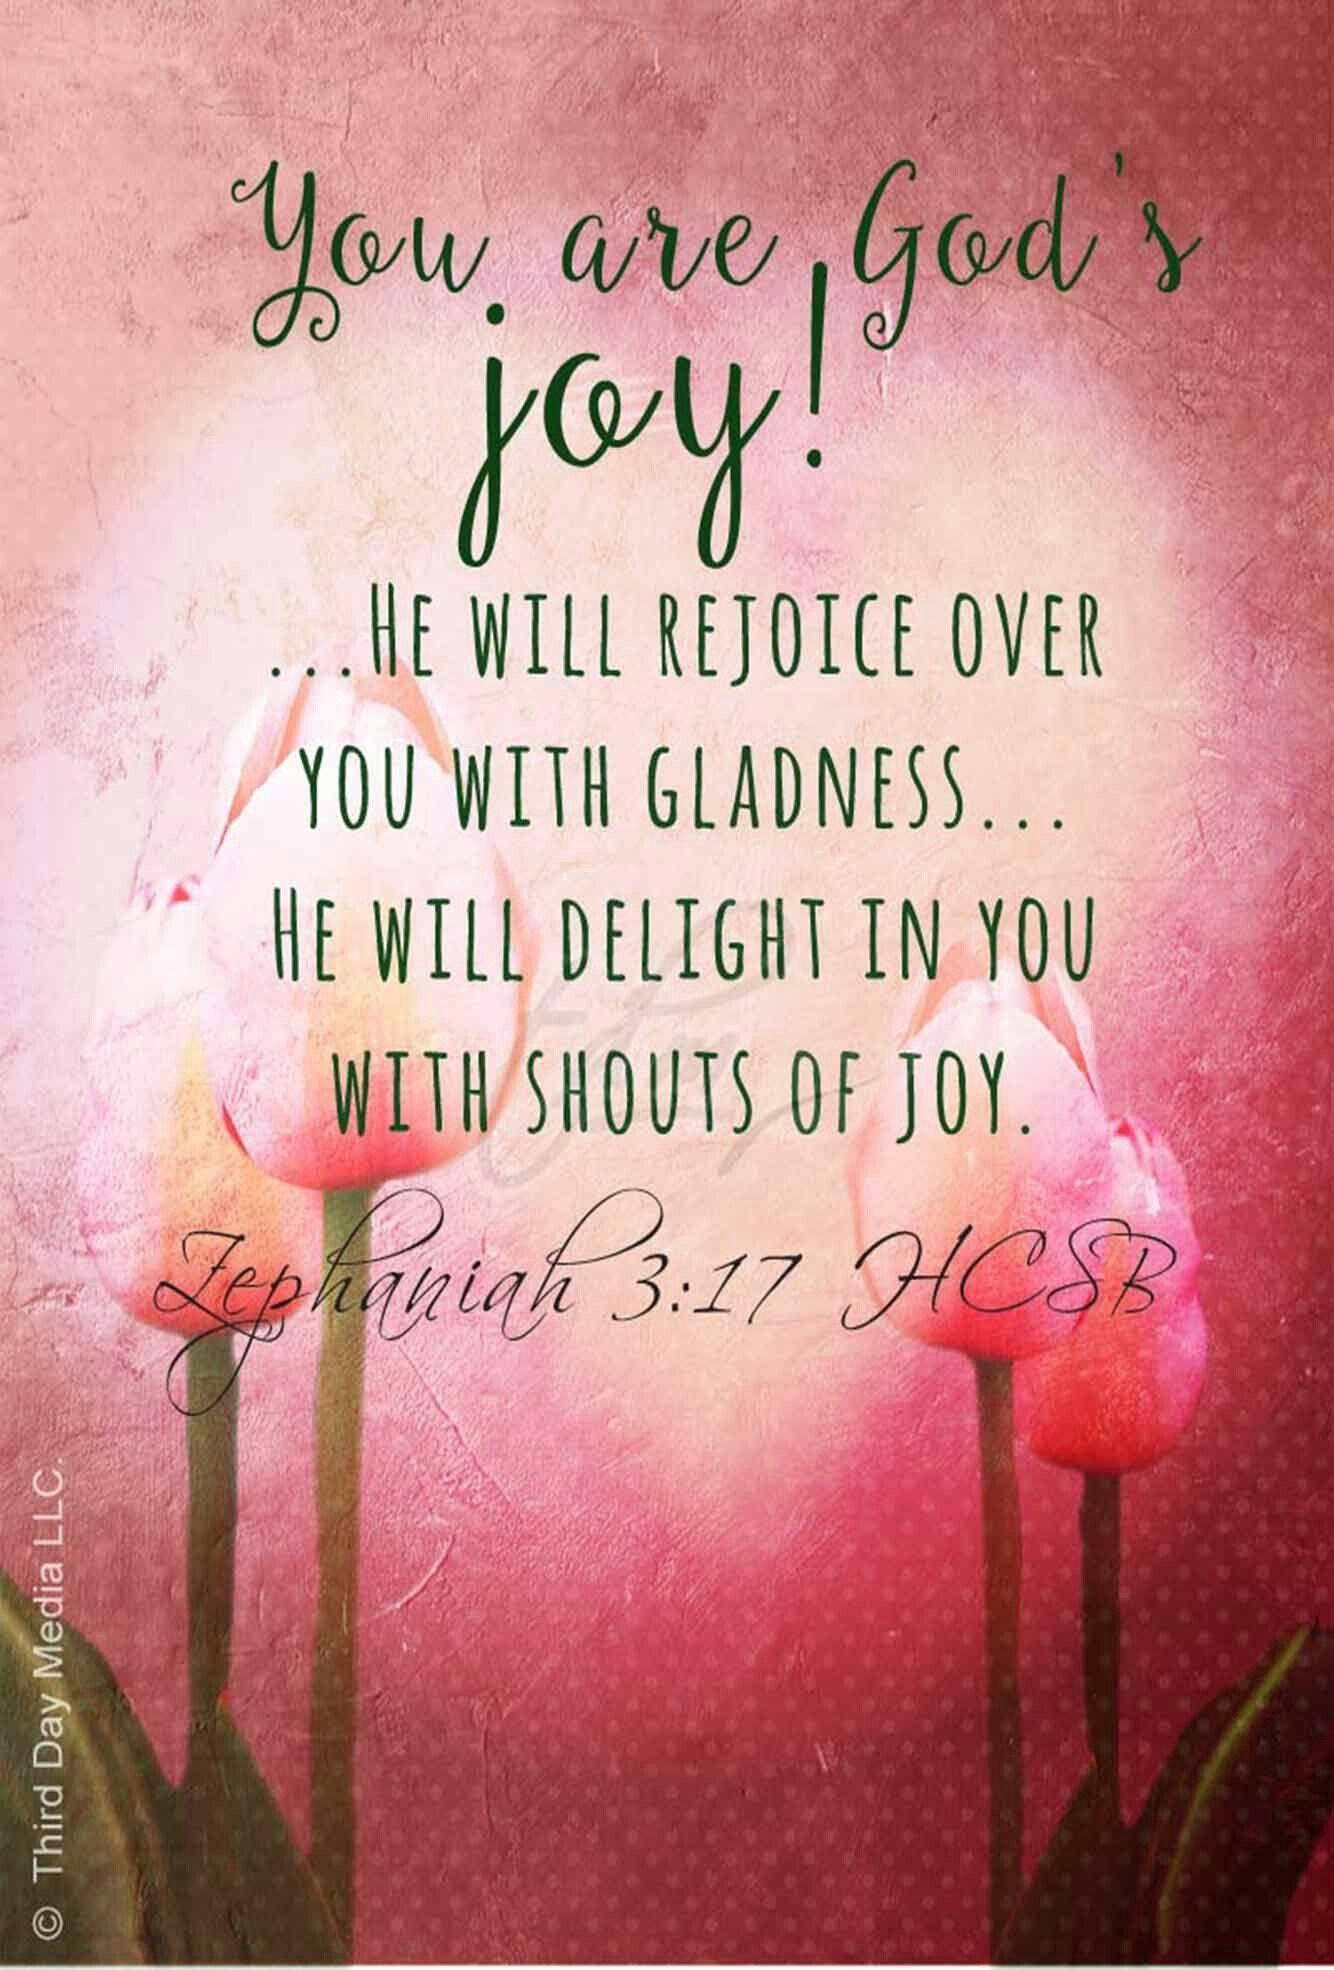 Nice Bible Scriptures On Joy Nkjv Scriptures On Joy Kjv You Are You Are Bible Verse Quotes Pinterest Verses